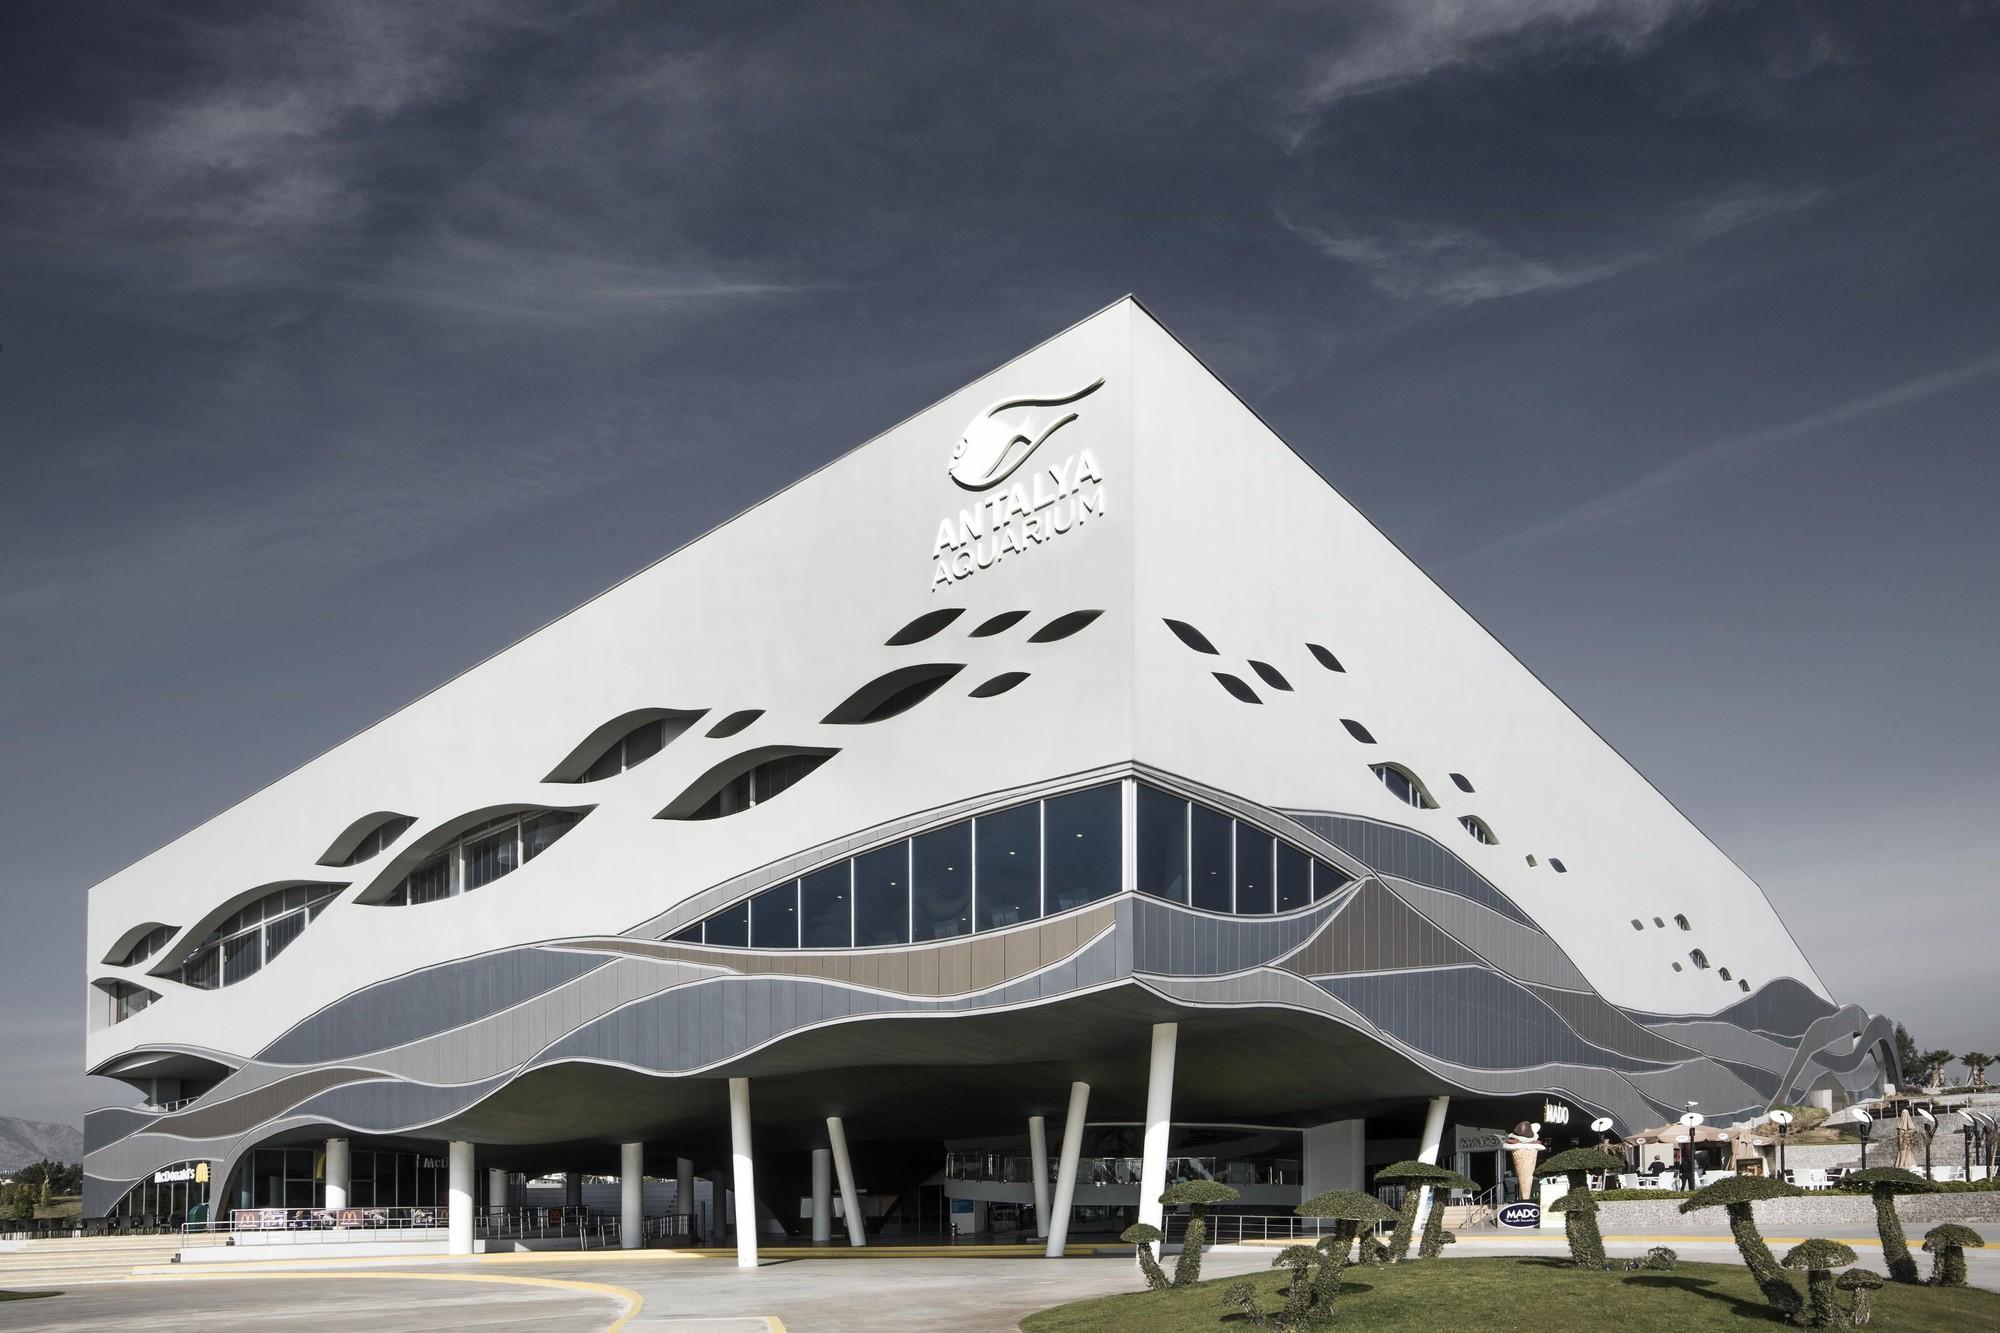 Antalya Aquarium / Bahadir Kul Architects, ©  Ket Kolektif